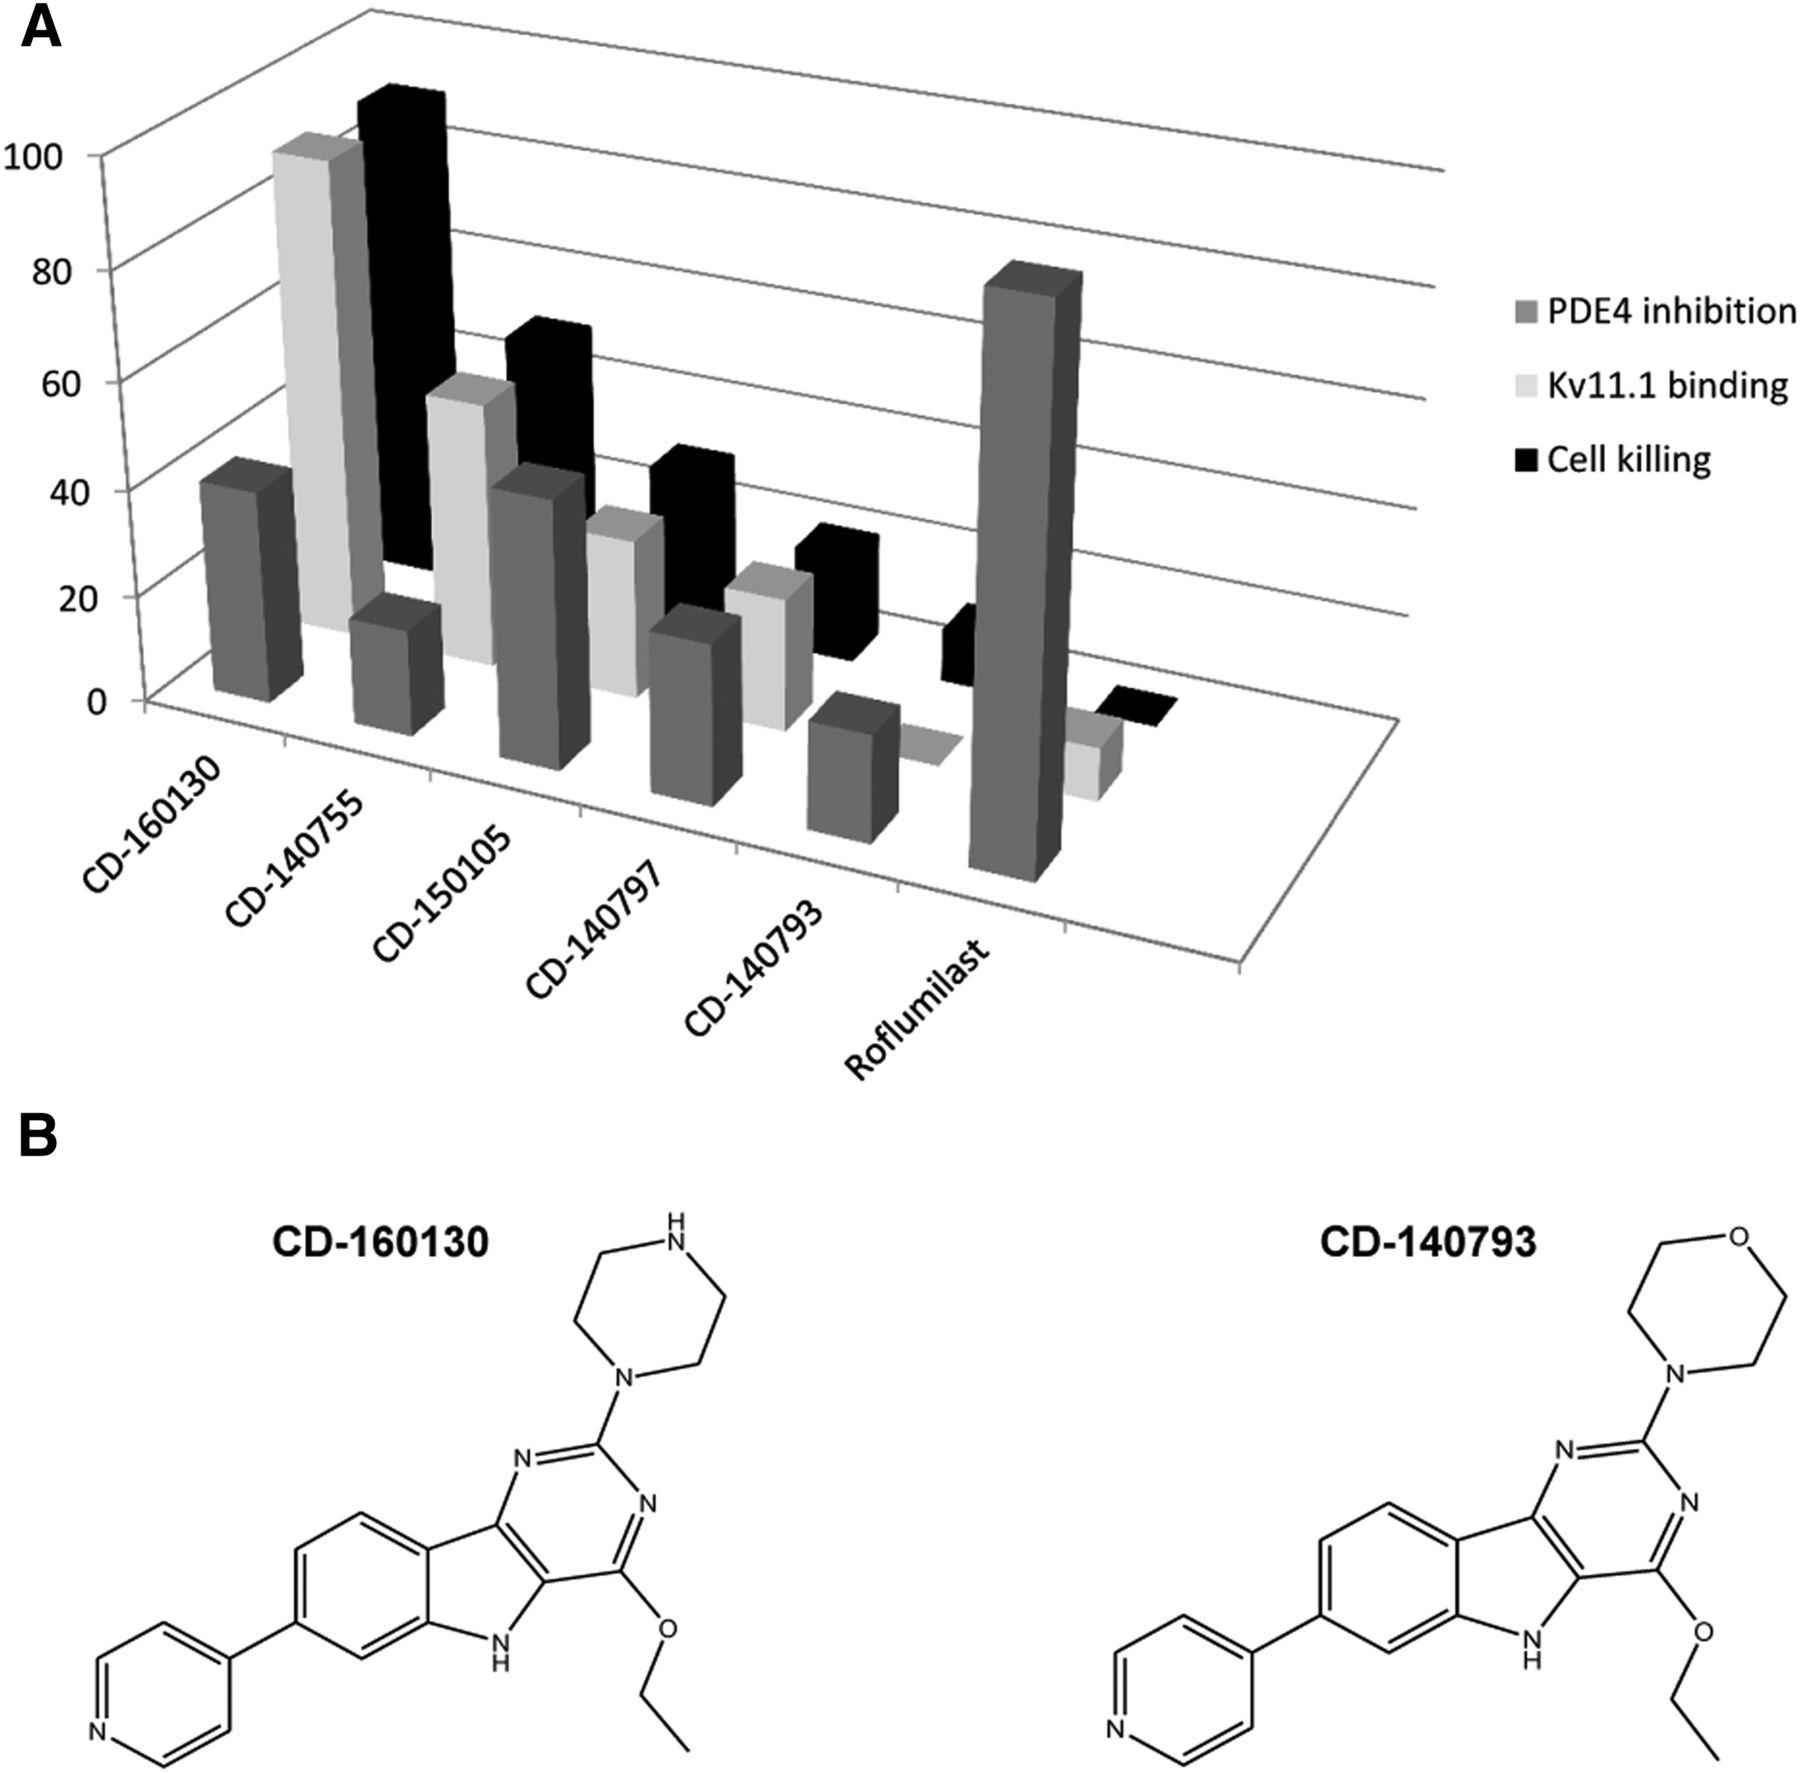 New Pyrimido-Indole Compound CD-160130 Preferentially